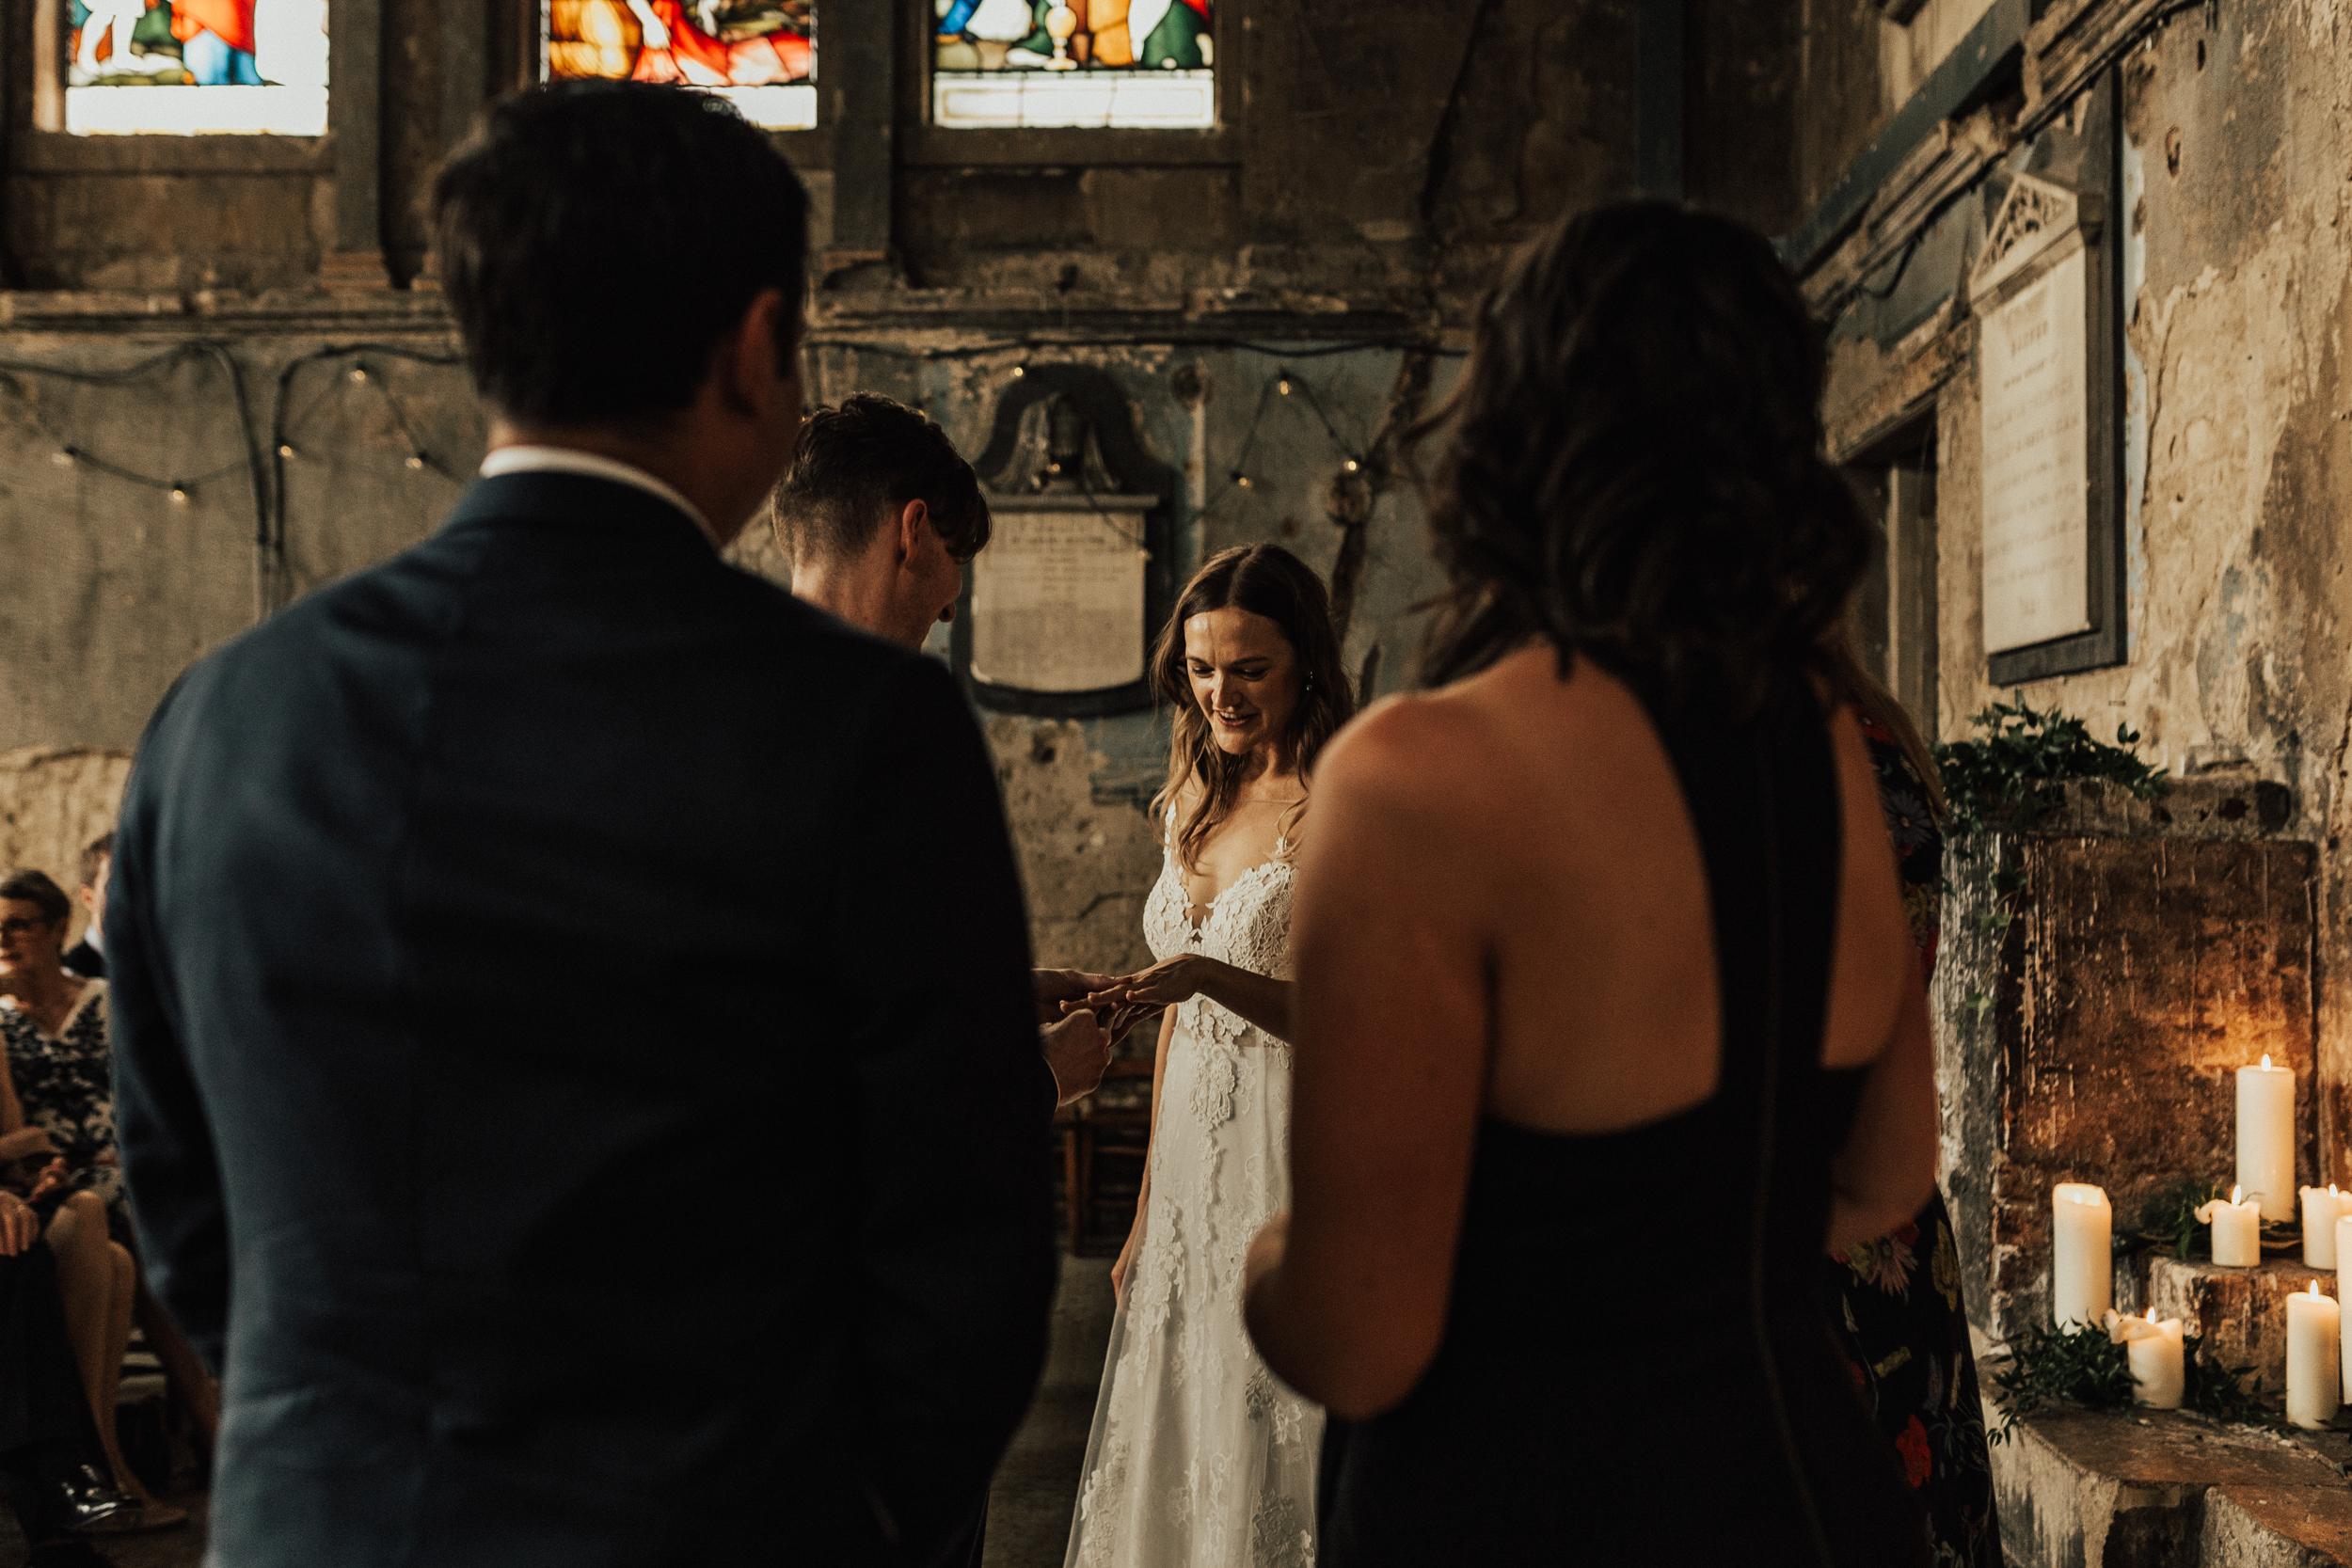 Laura-Benn-The-Asylum-London-The-Ace-Hotel-Wedding-Alternative-Darina-Stoda-Photography-202.jpg